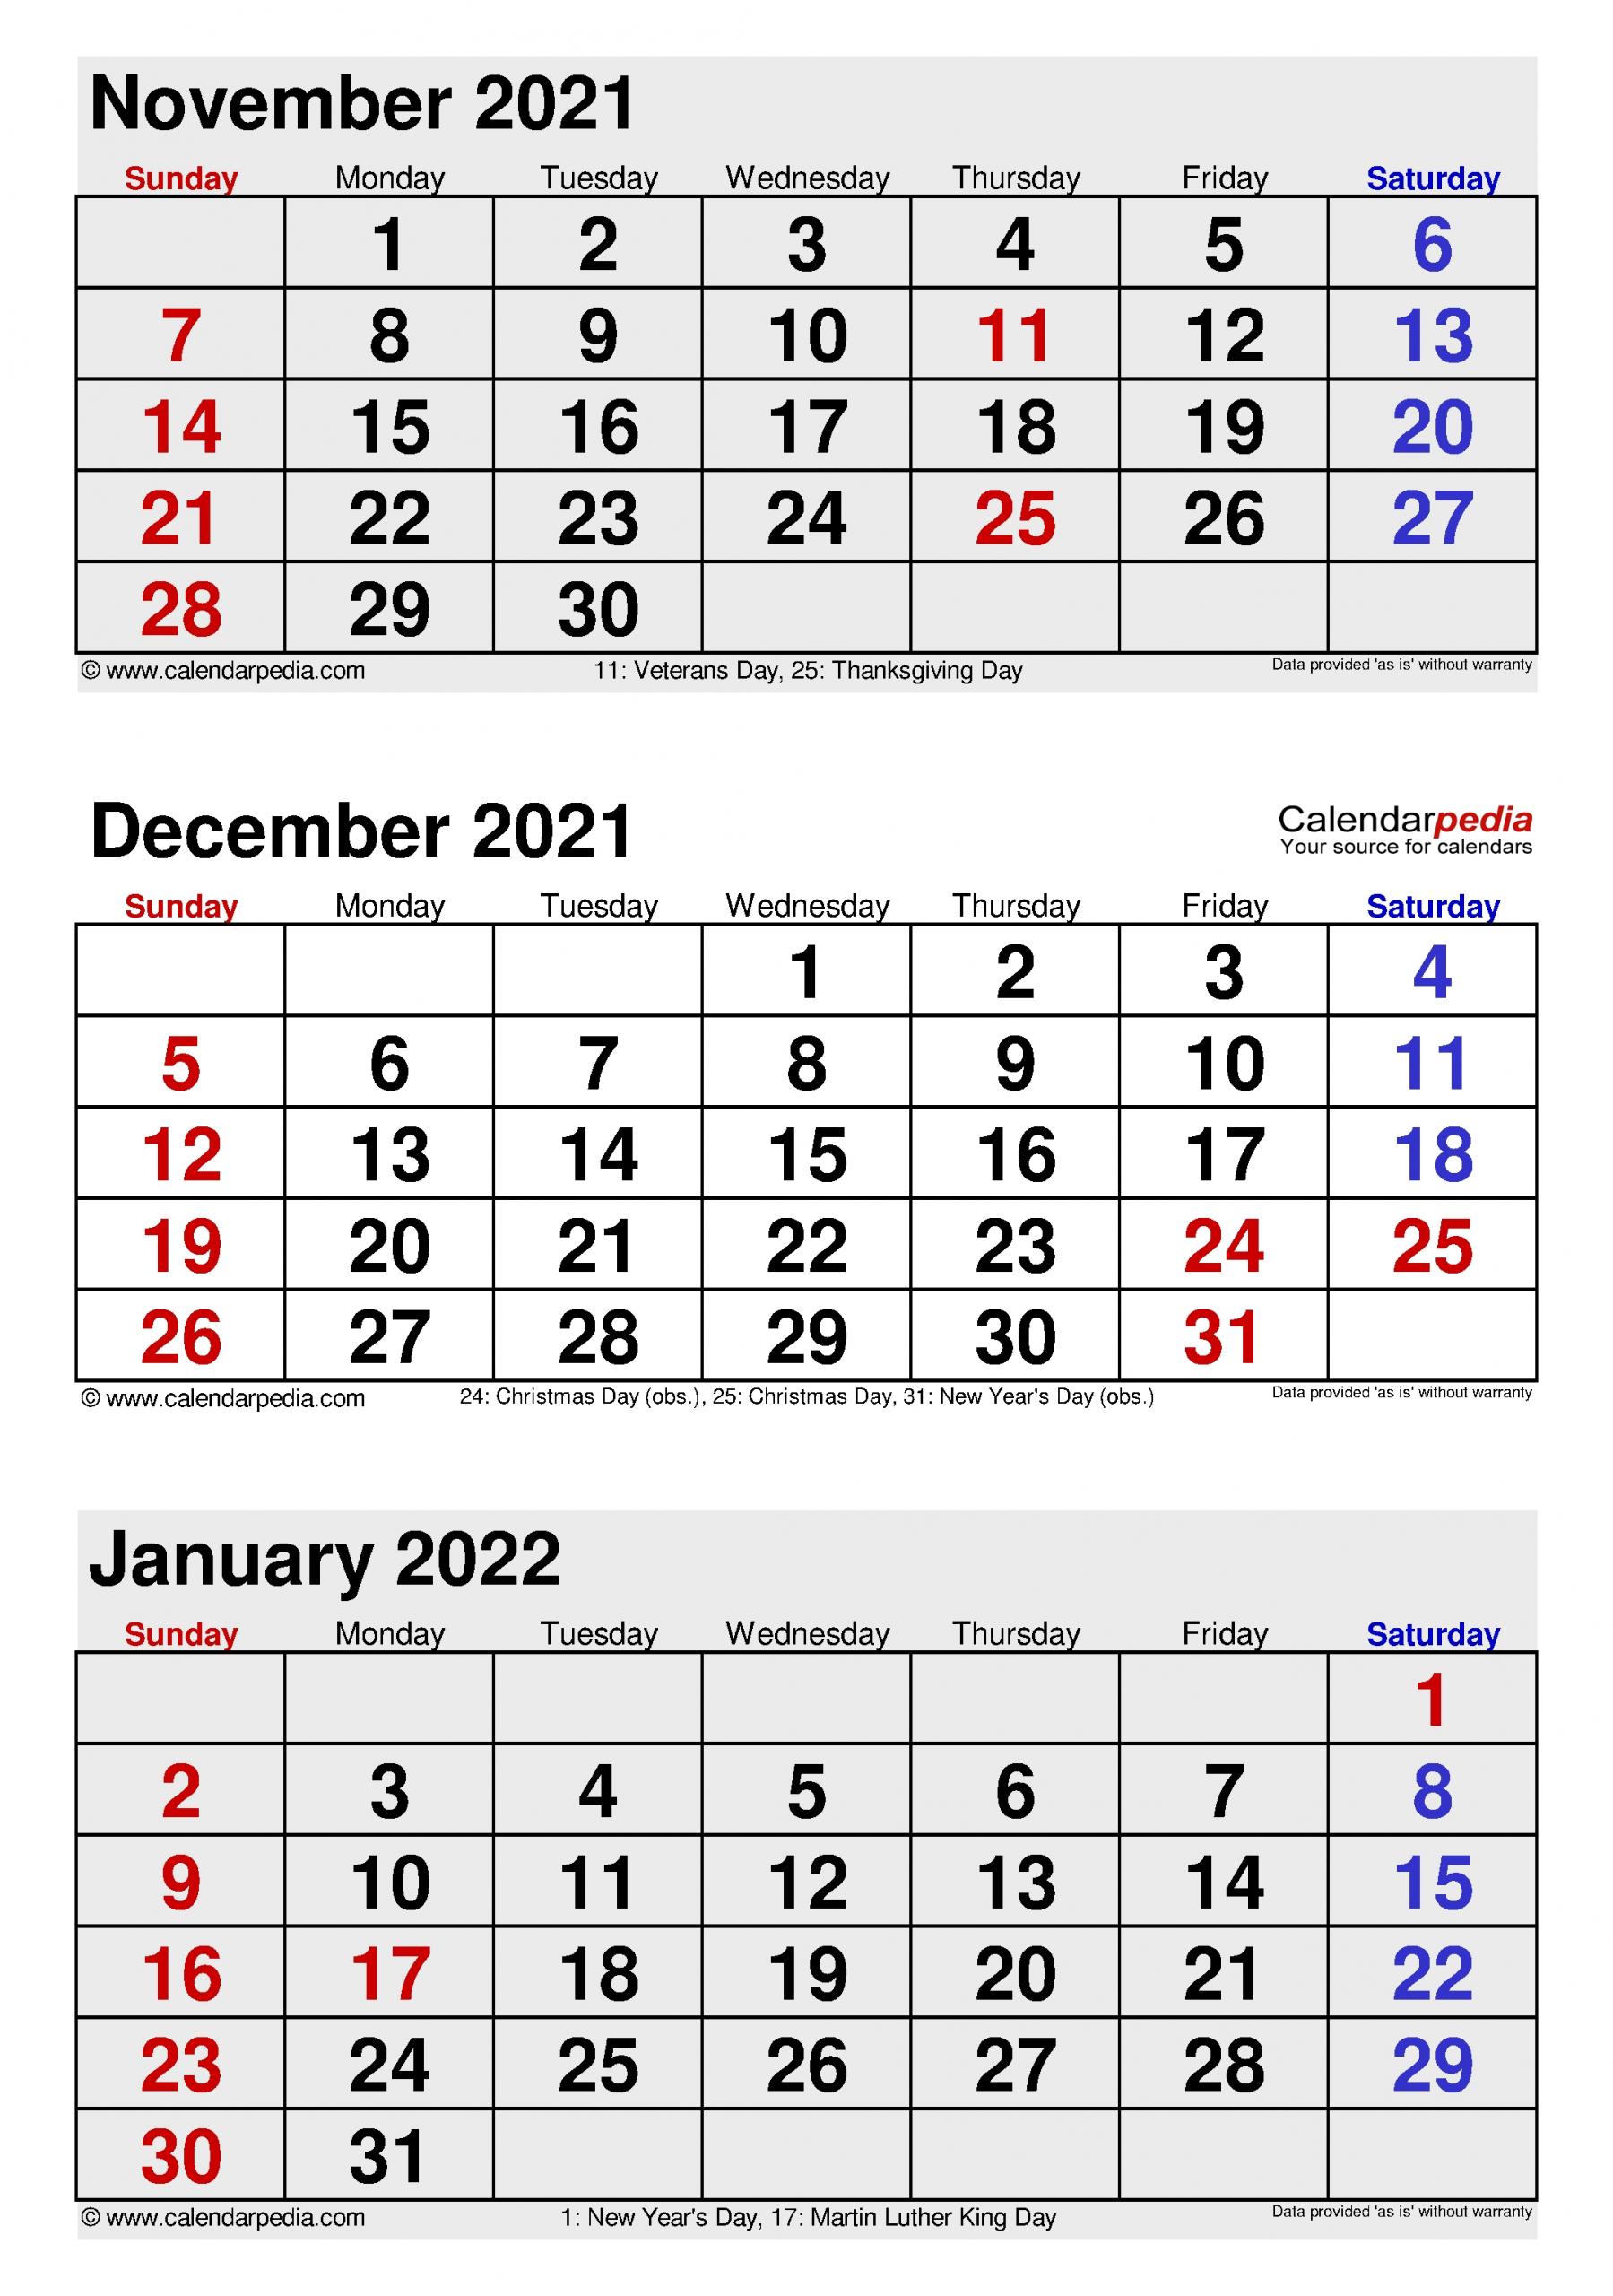 Get Calendar November - December 2021